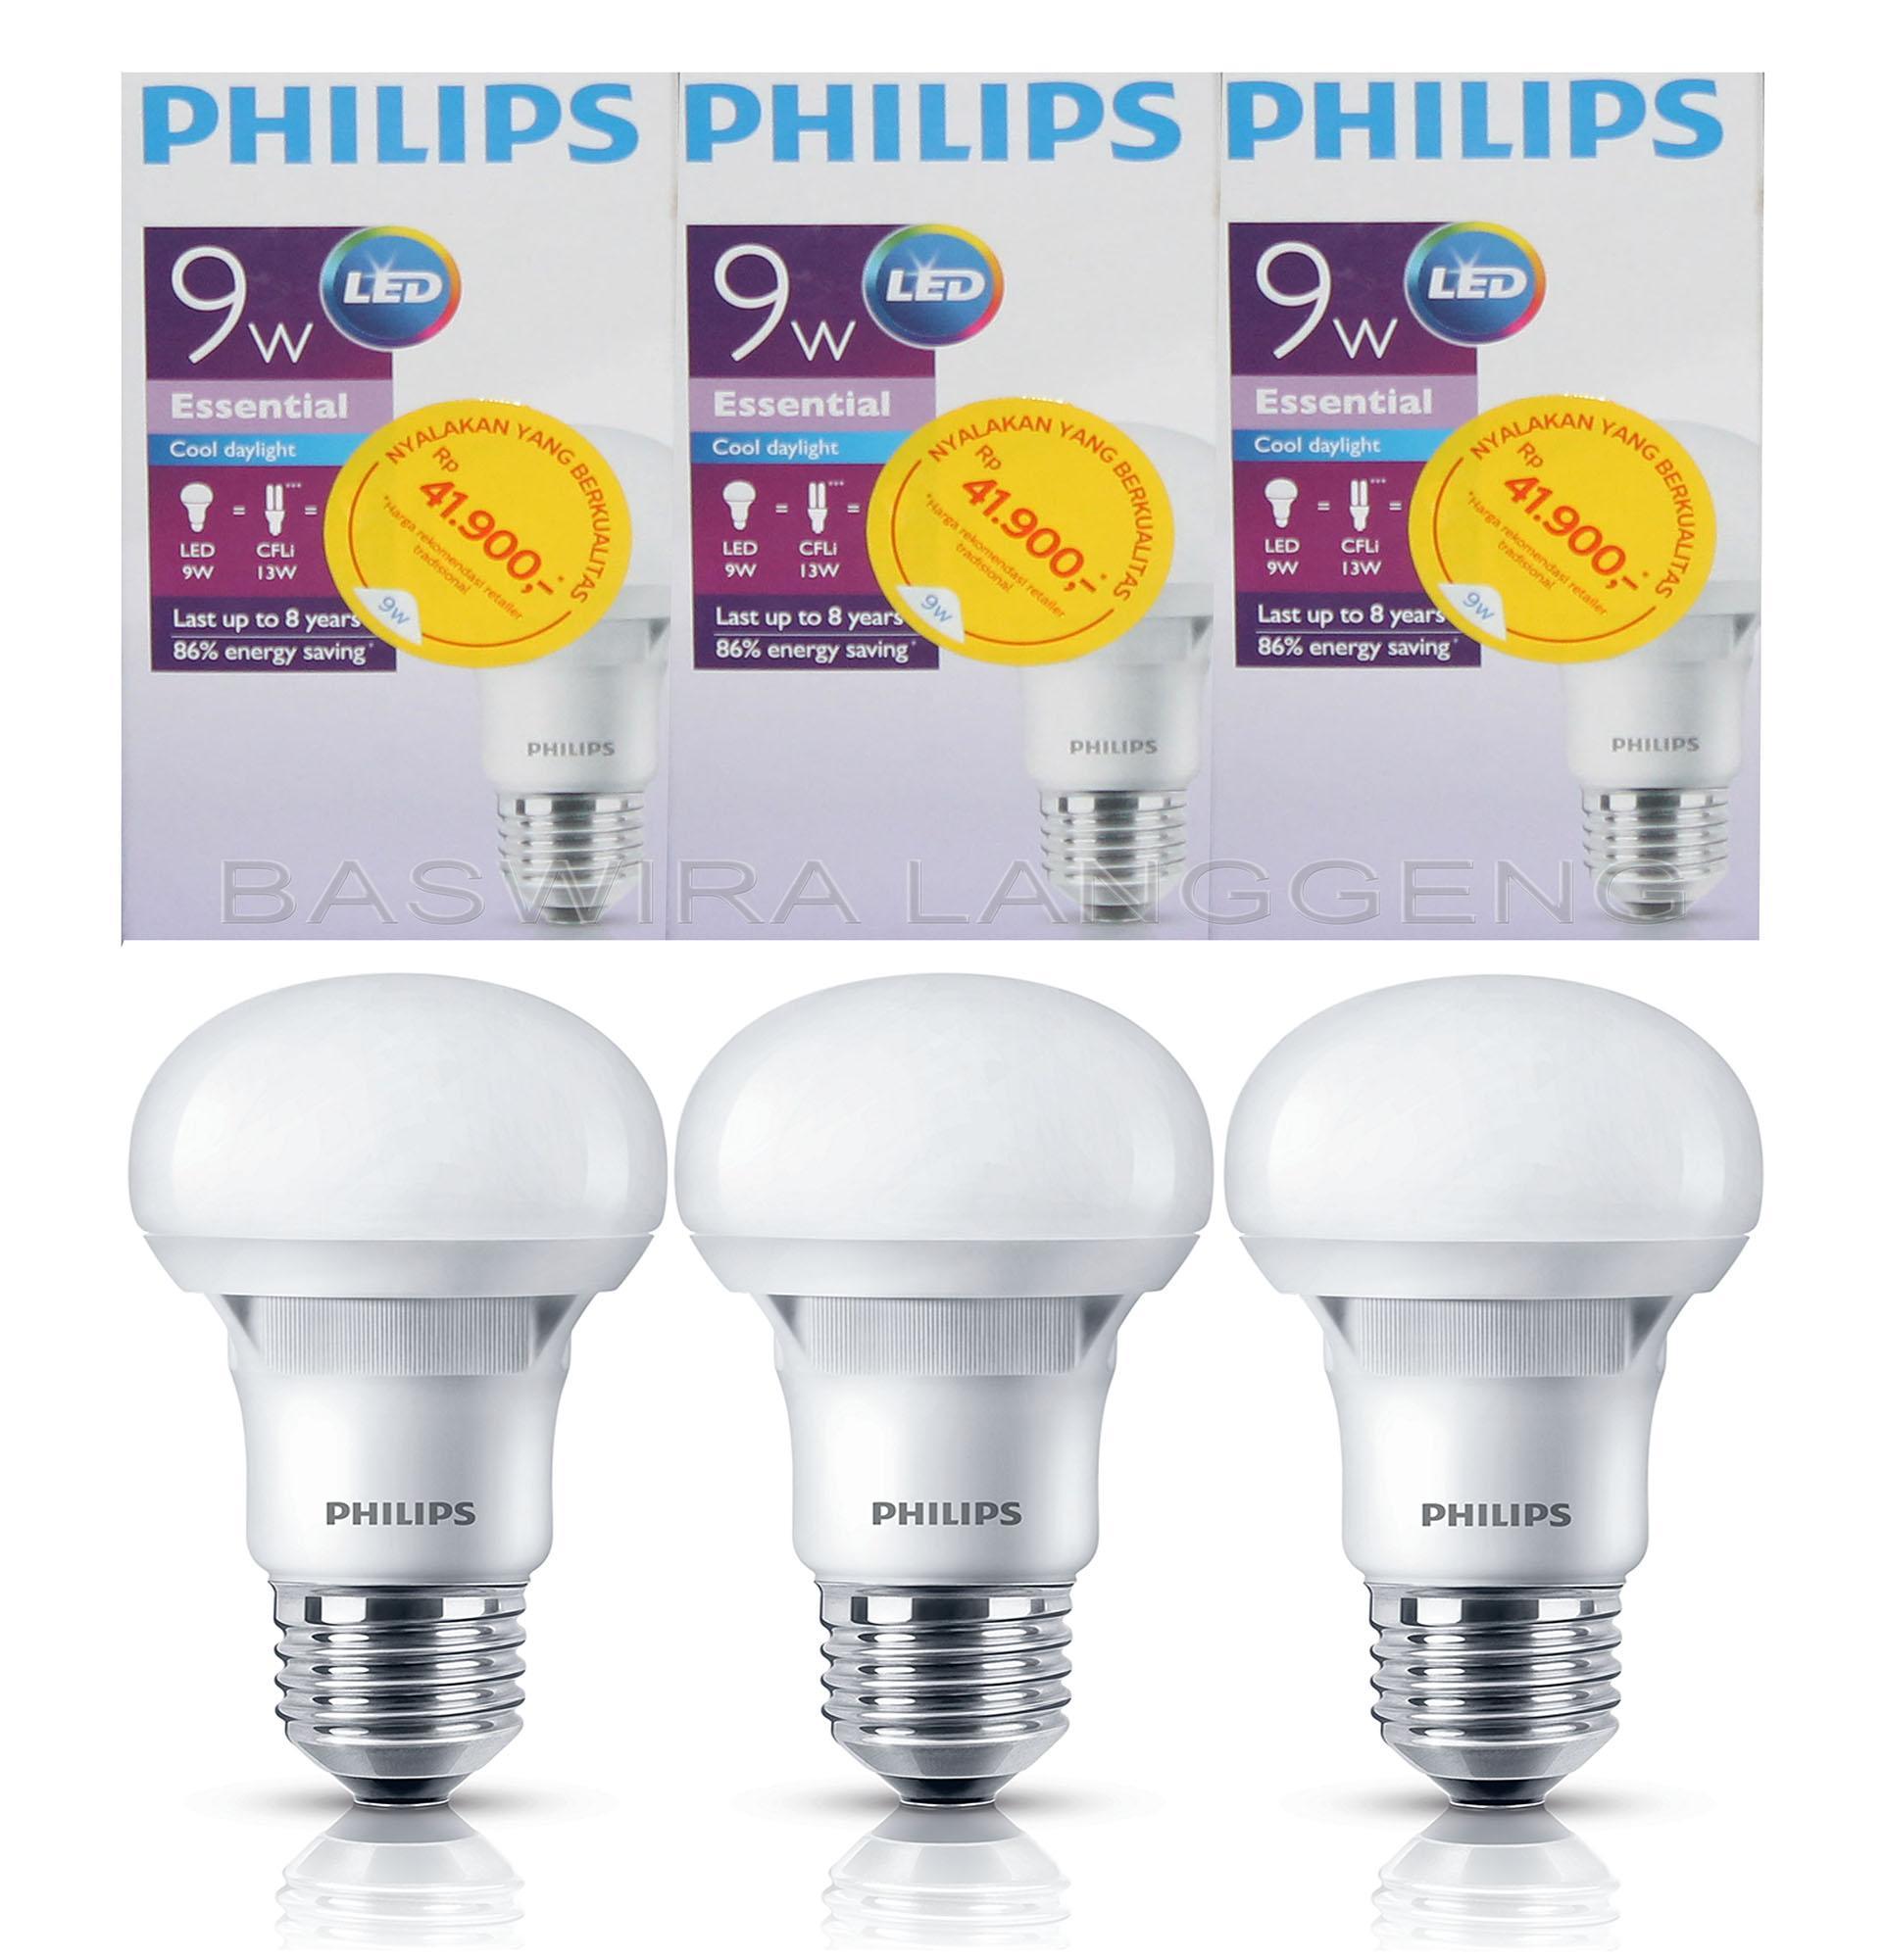 Toko Indonesia Best Buy Peralatan Mandi 99 13 11 18 Lampu Phillips Led Watt Paketan Philips Bulb Essential 9 Wat W 9watt 9w Paket Isi 3 Pcs